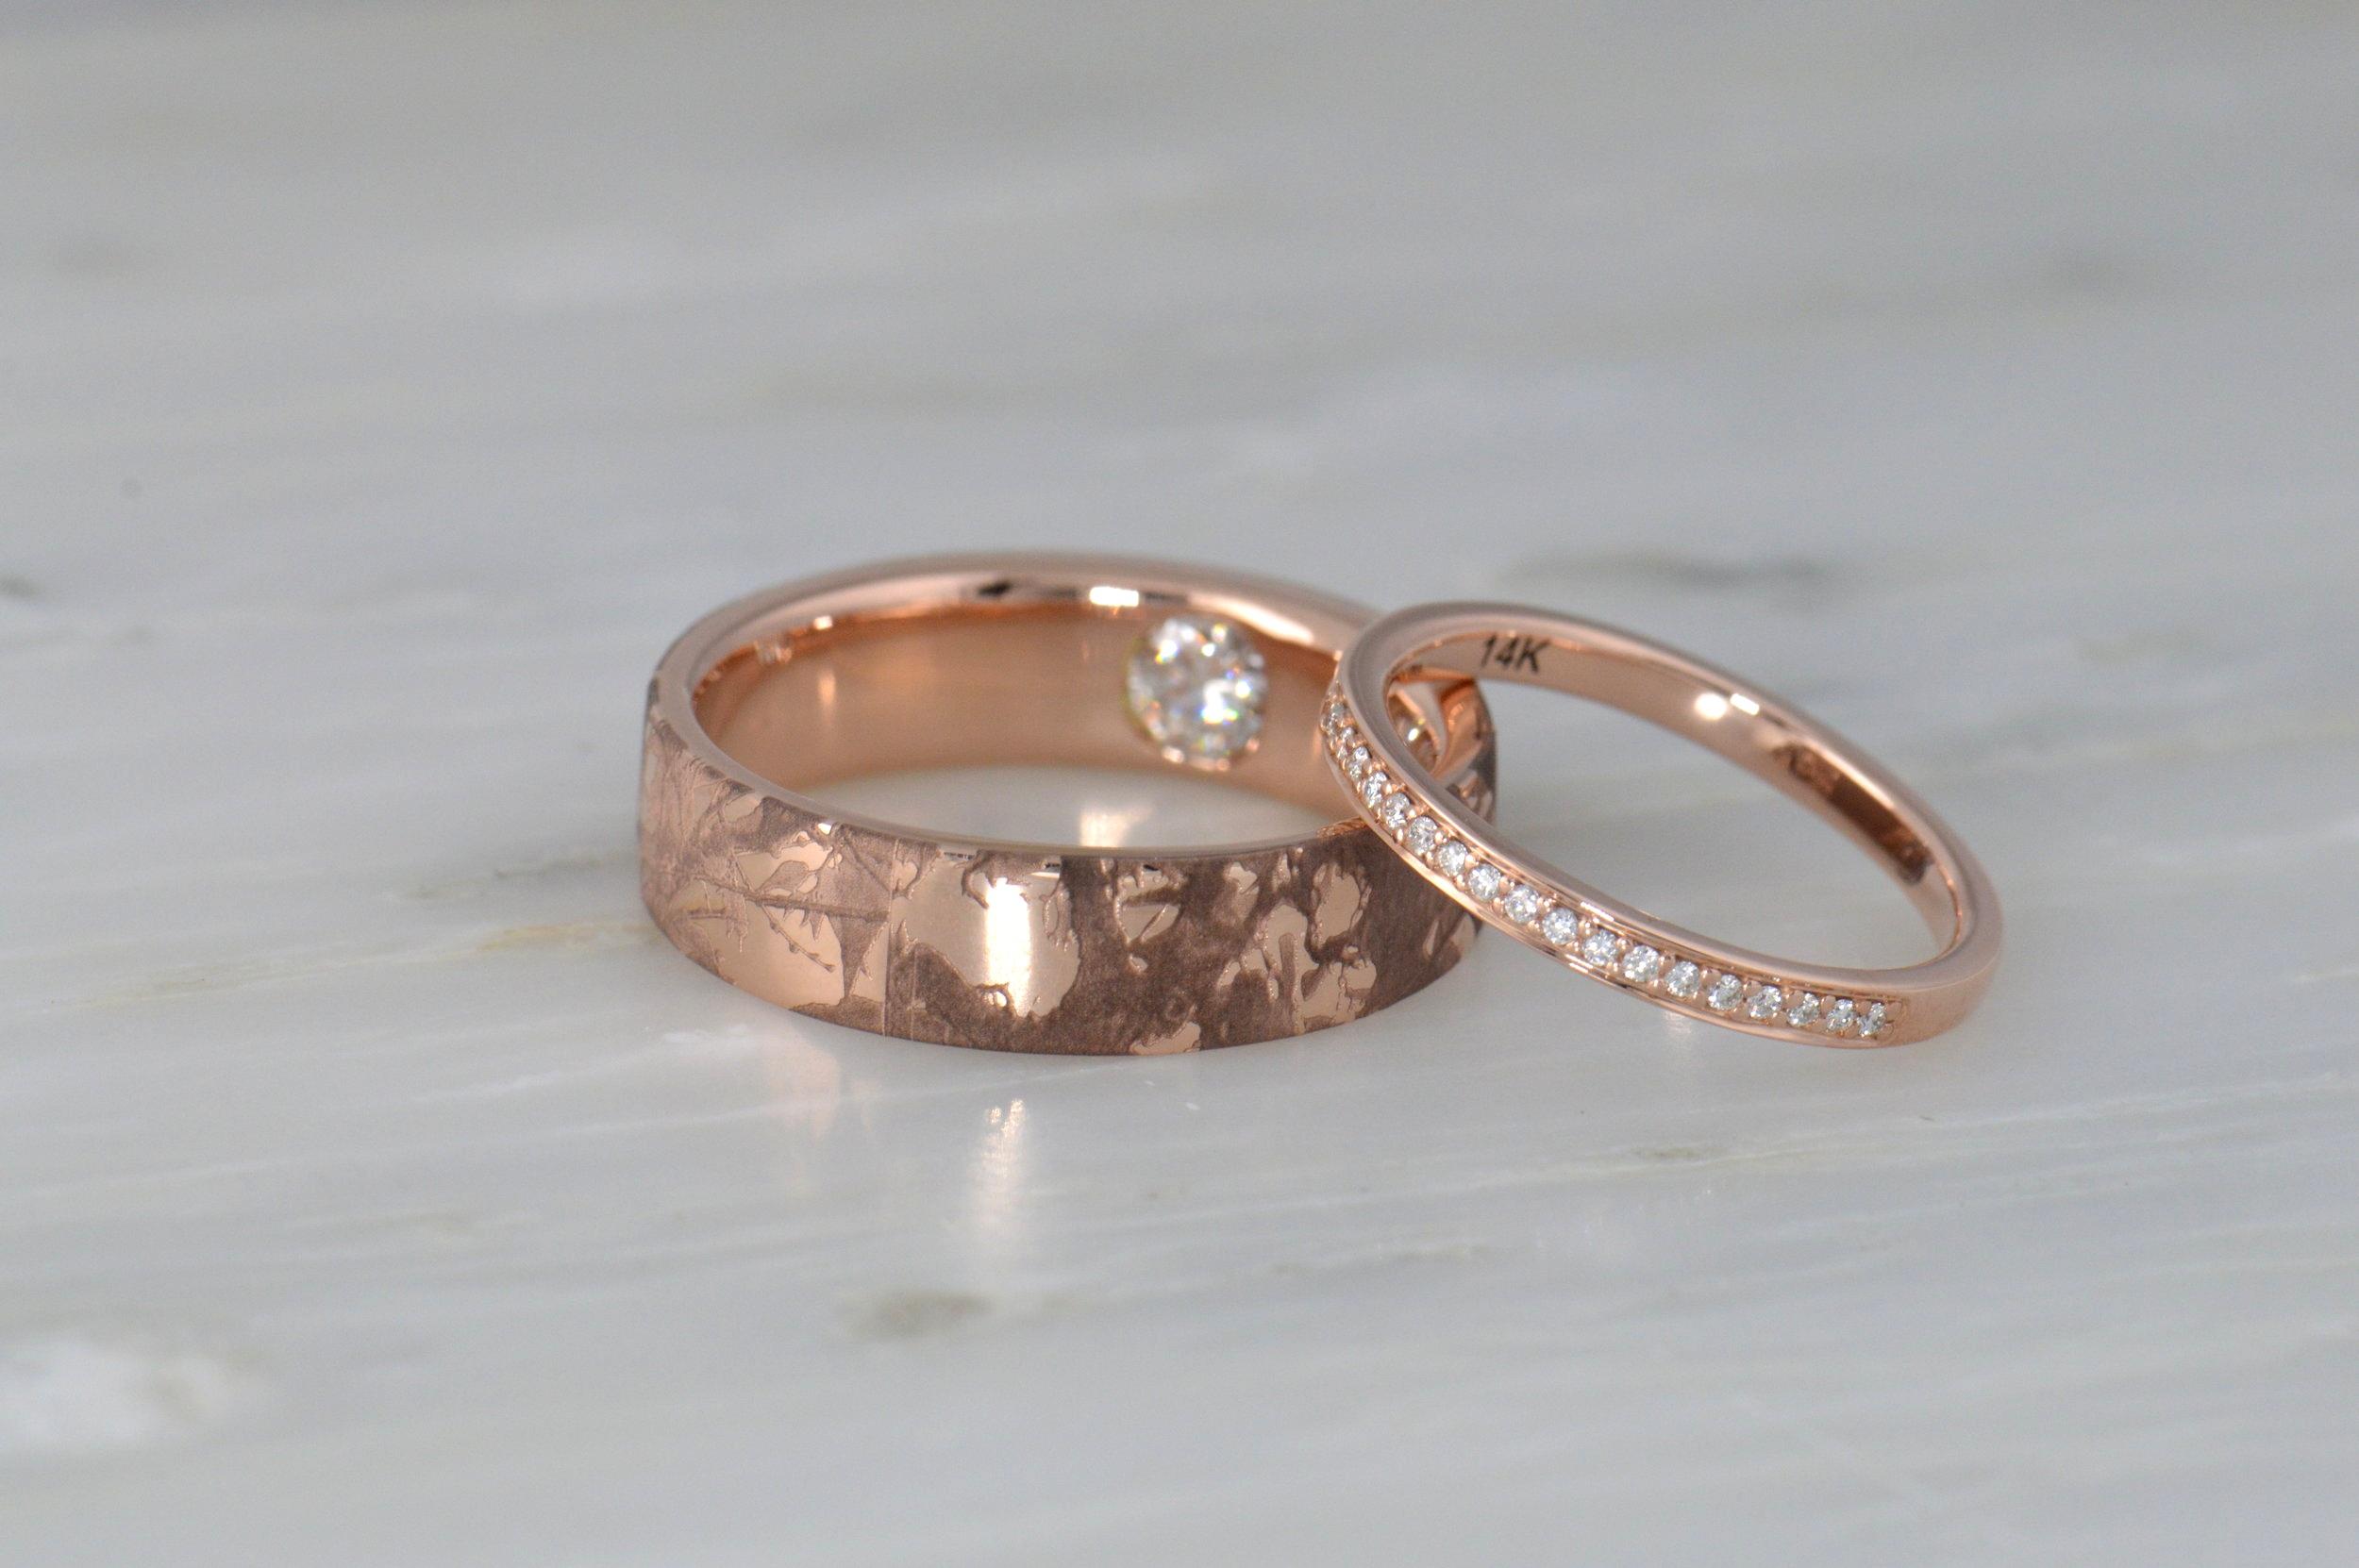 darvier-rose-gold-diamond-secret-engraved-wedding-set.JPG